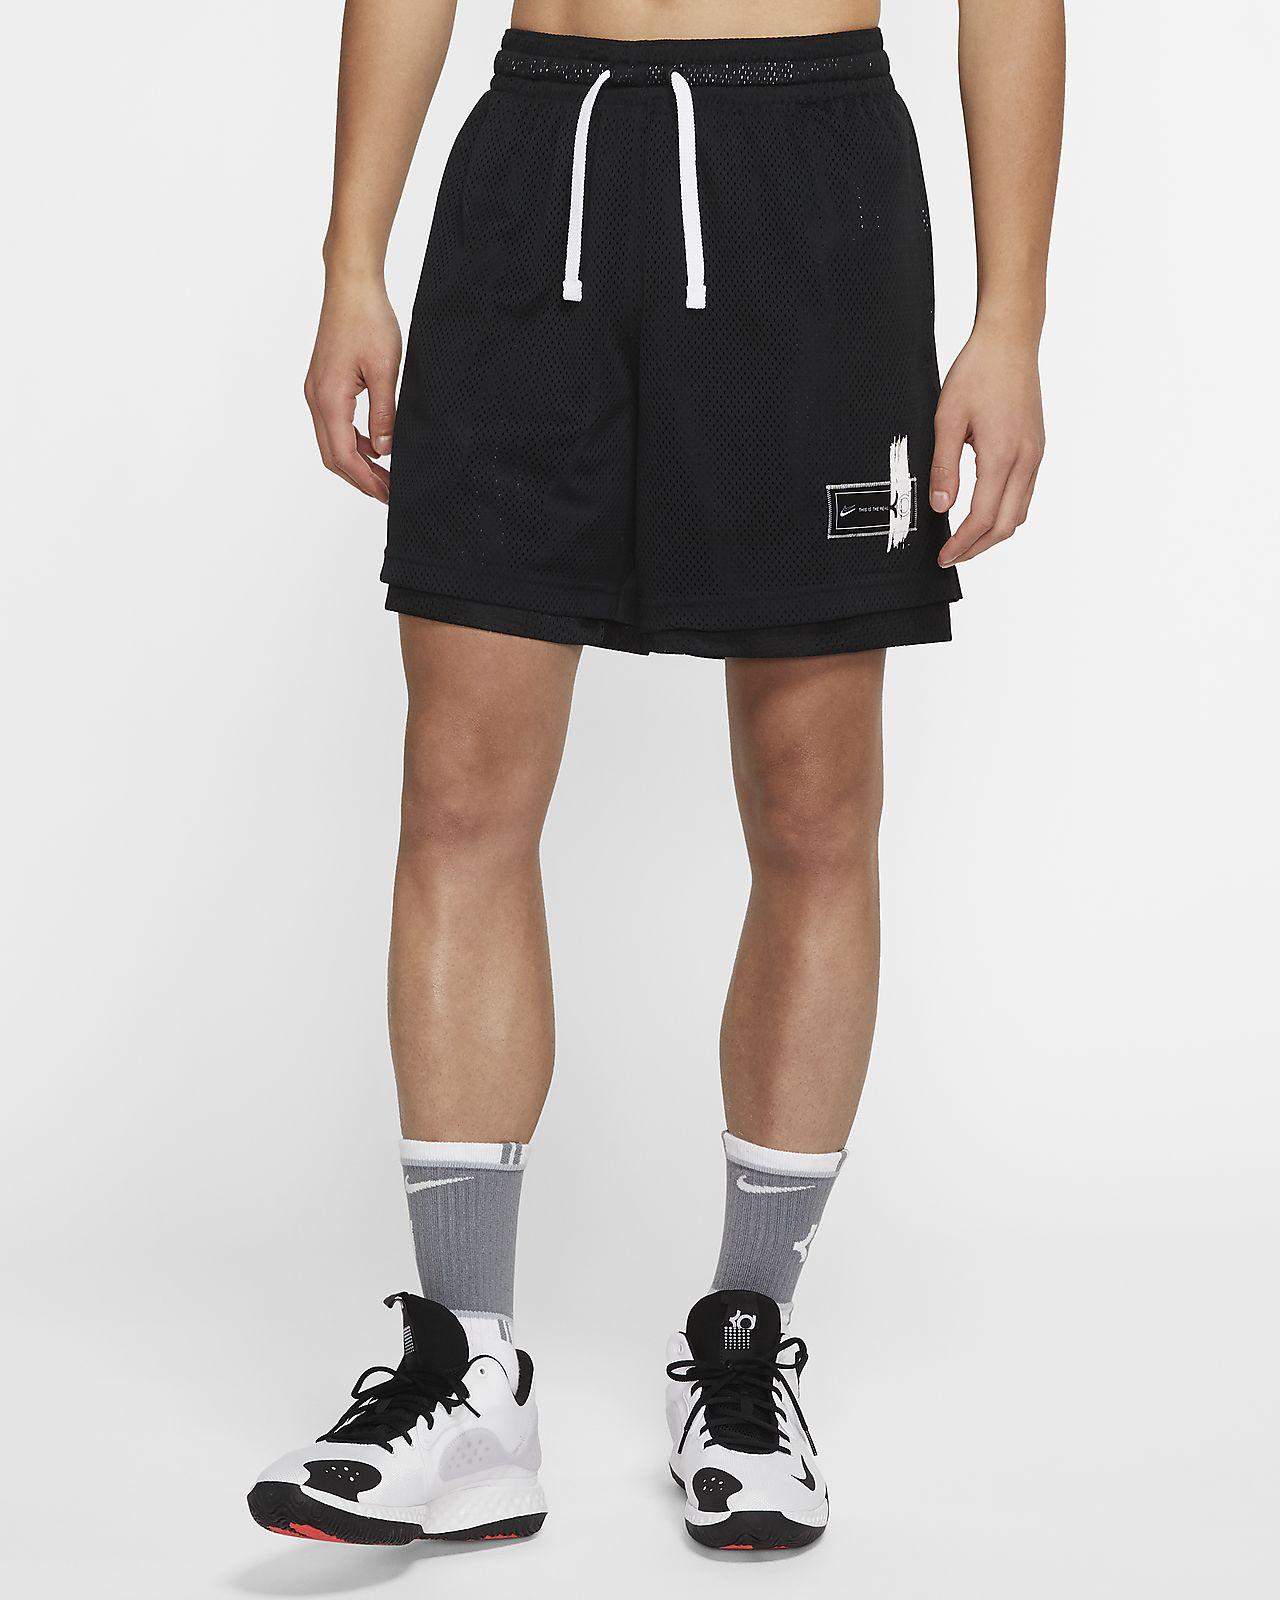 KD Nike 男子篮球短裤